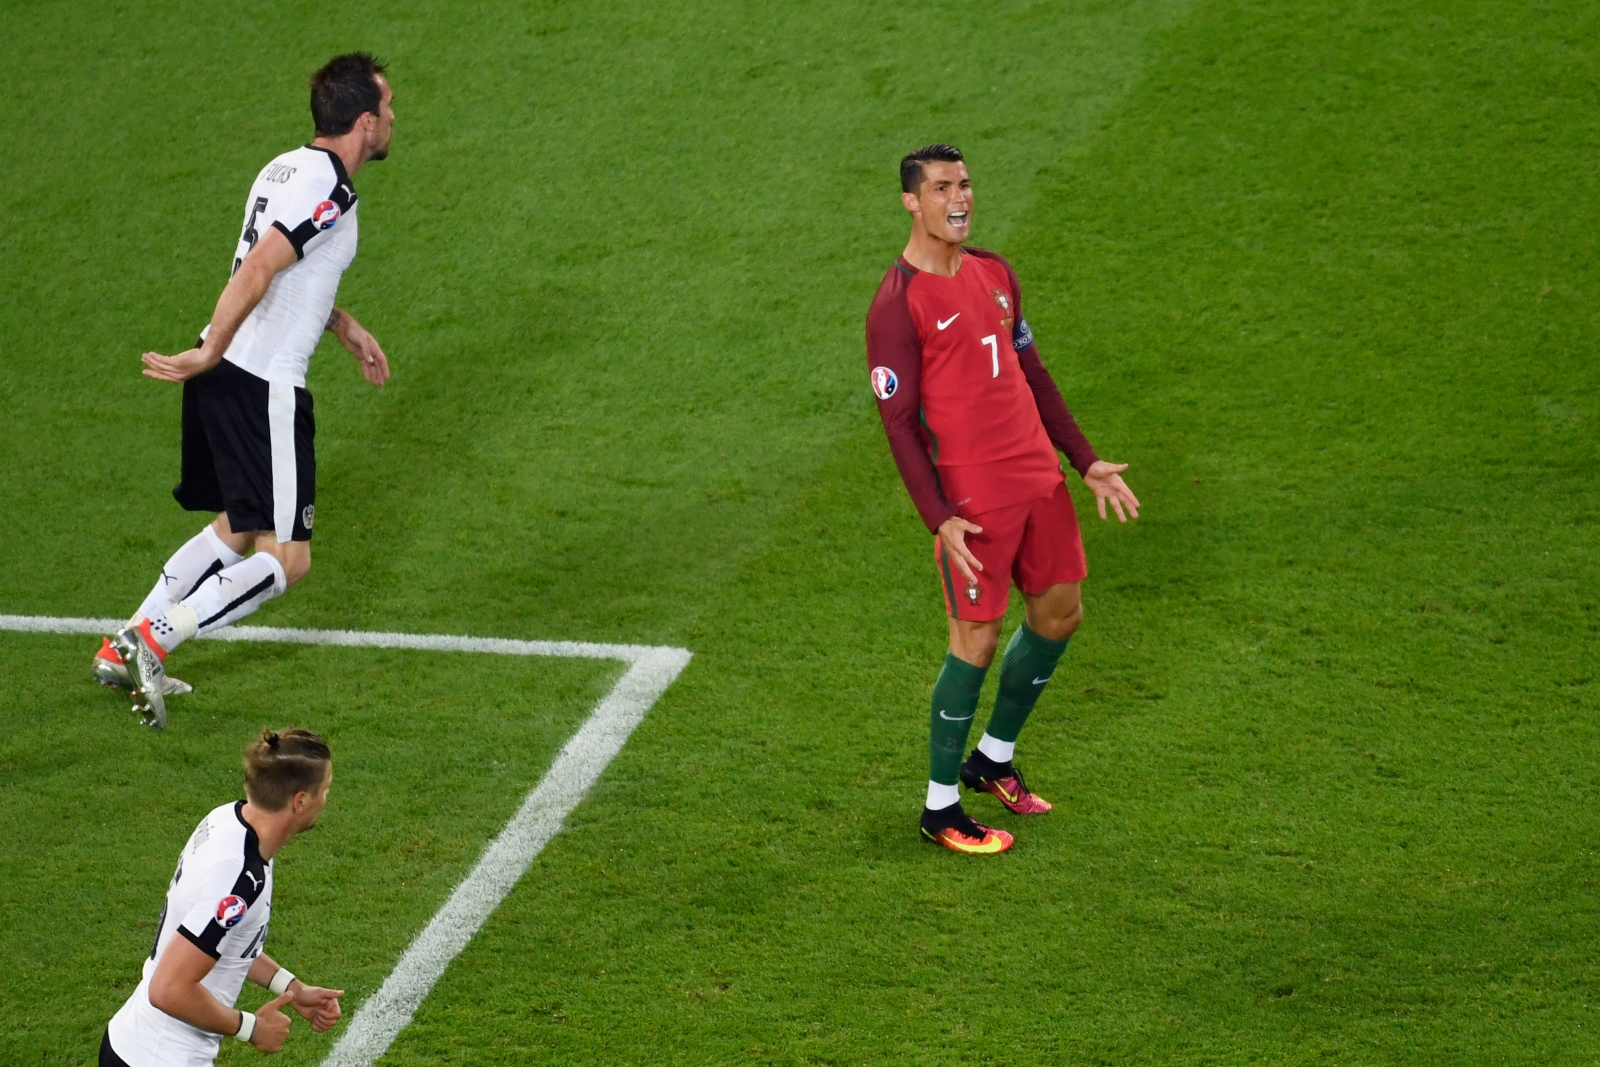 Ronaldo shows his frustration